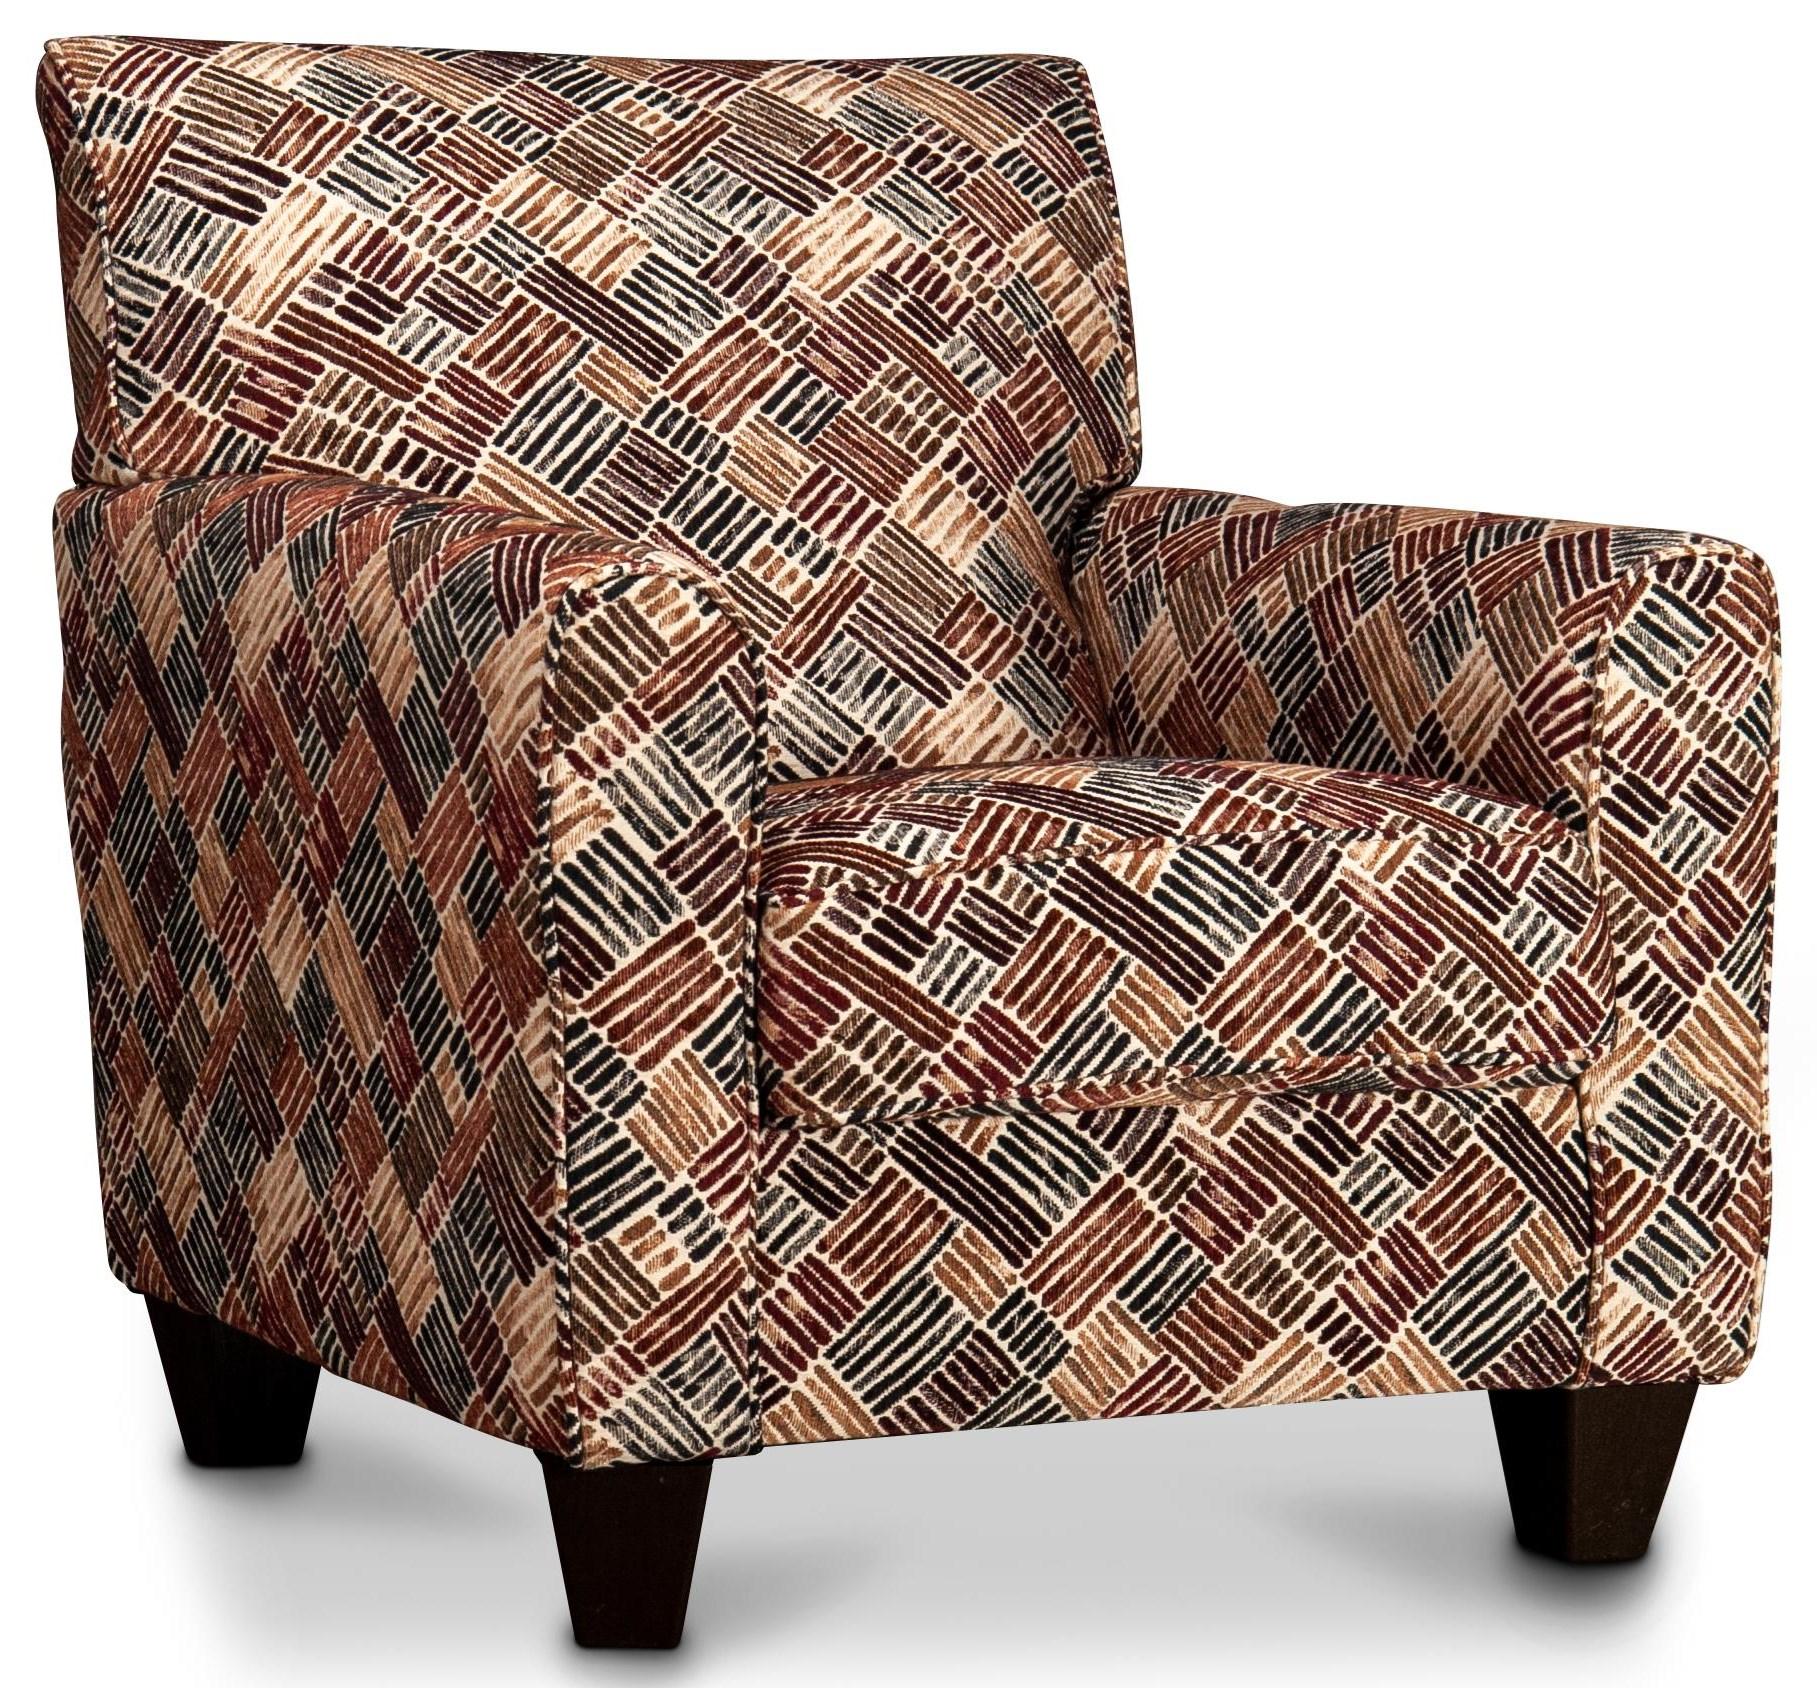 Noah Noah Accent Chair by Lane at Morris Home